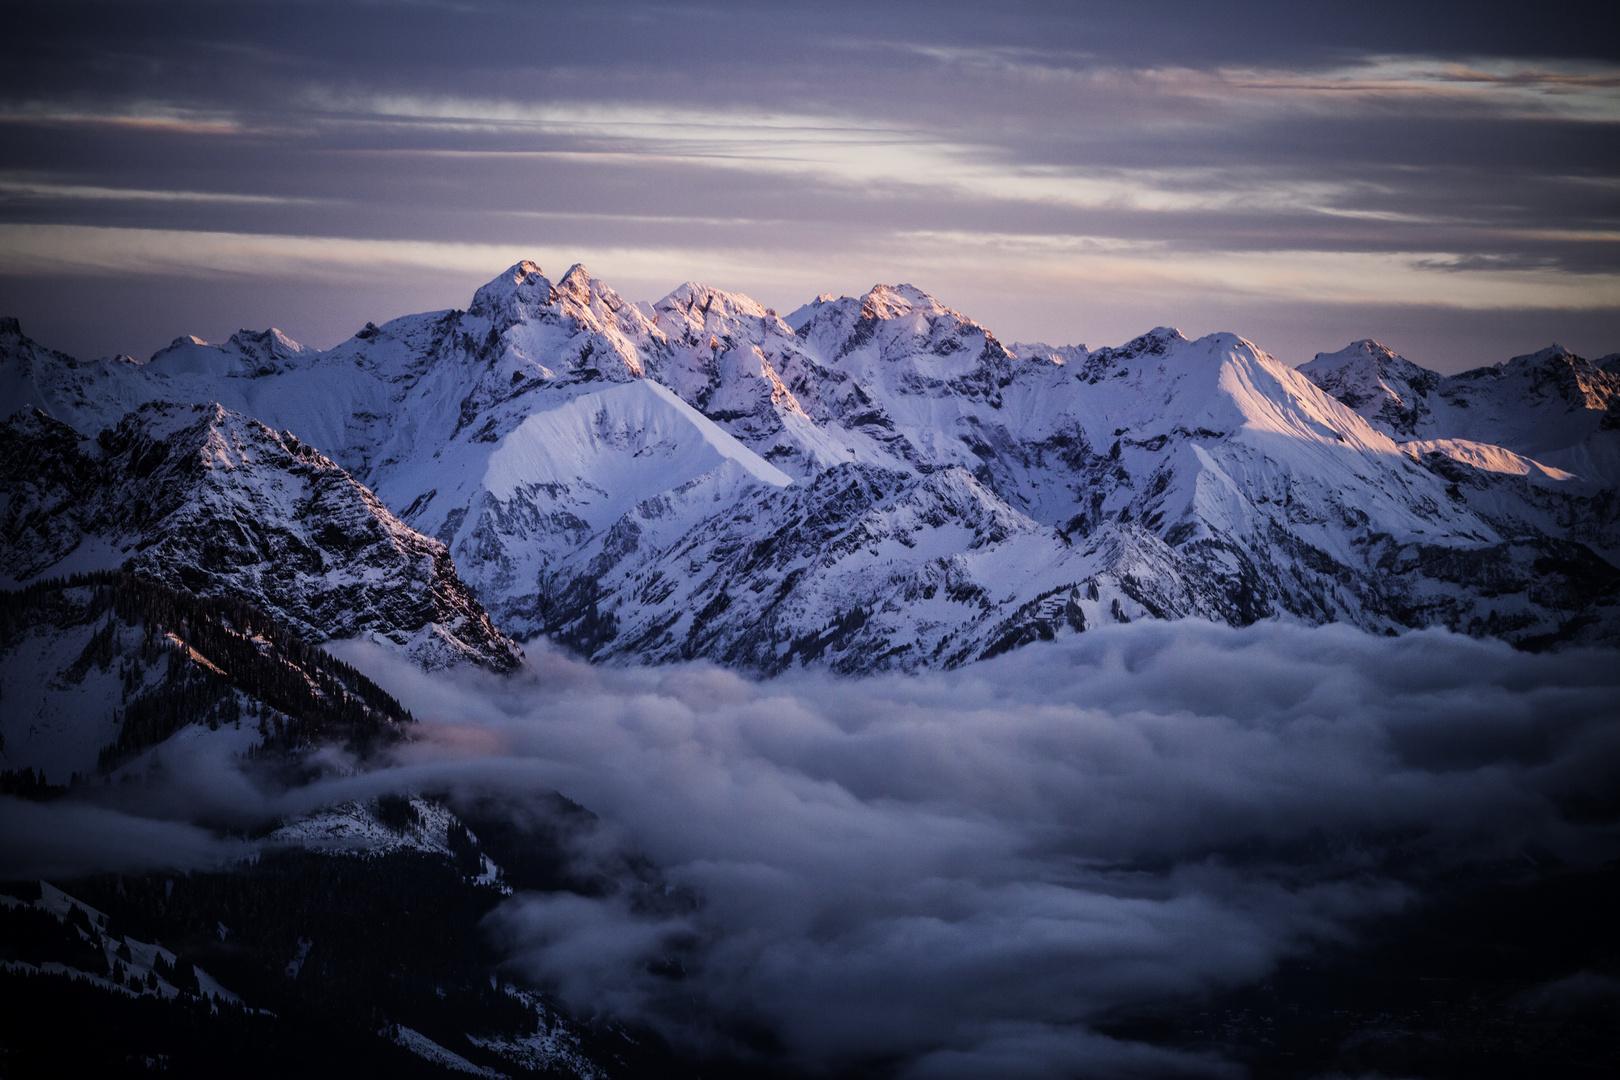 Sonnenuntergang Allgäuer Alpen